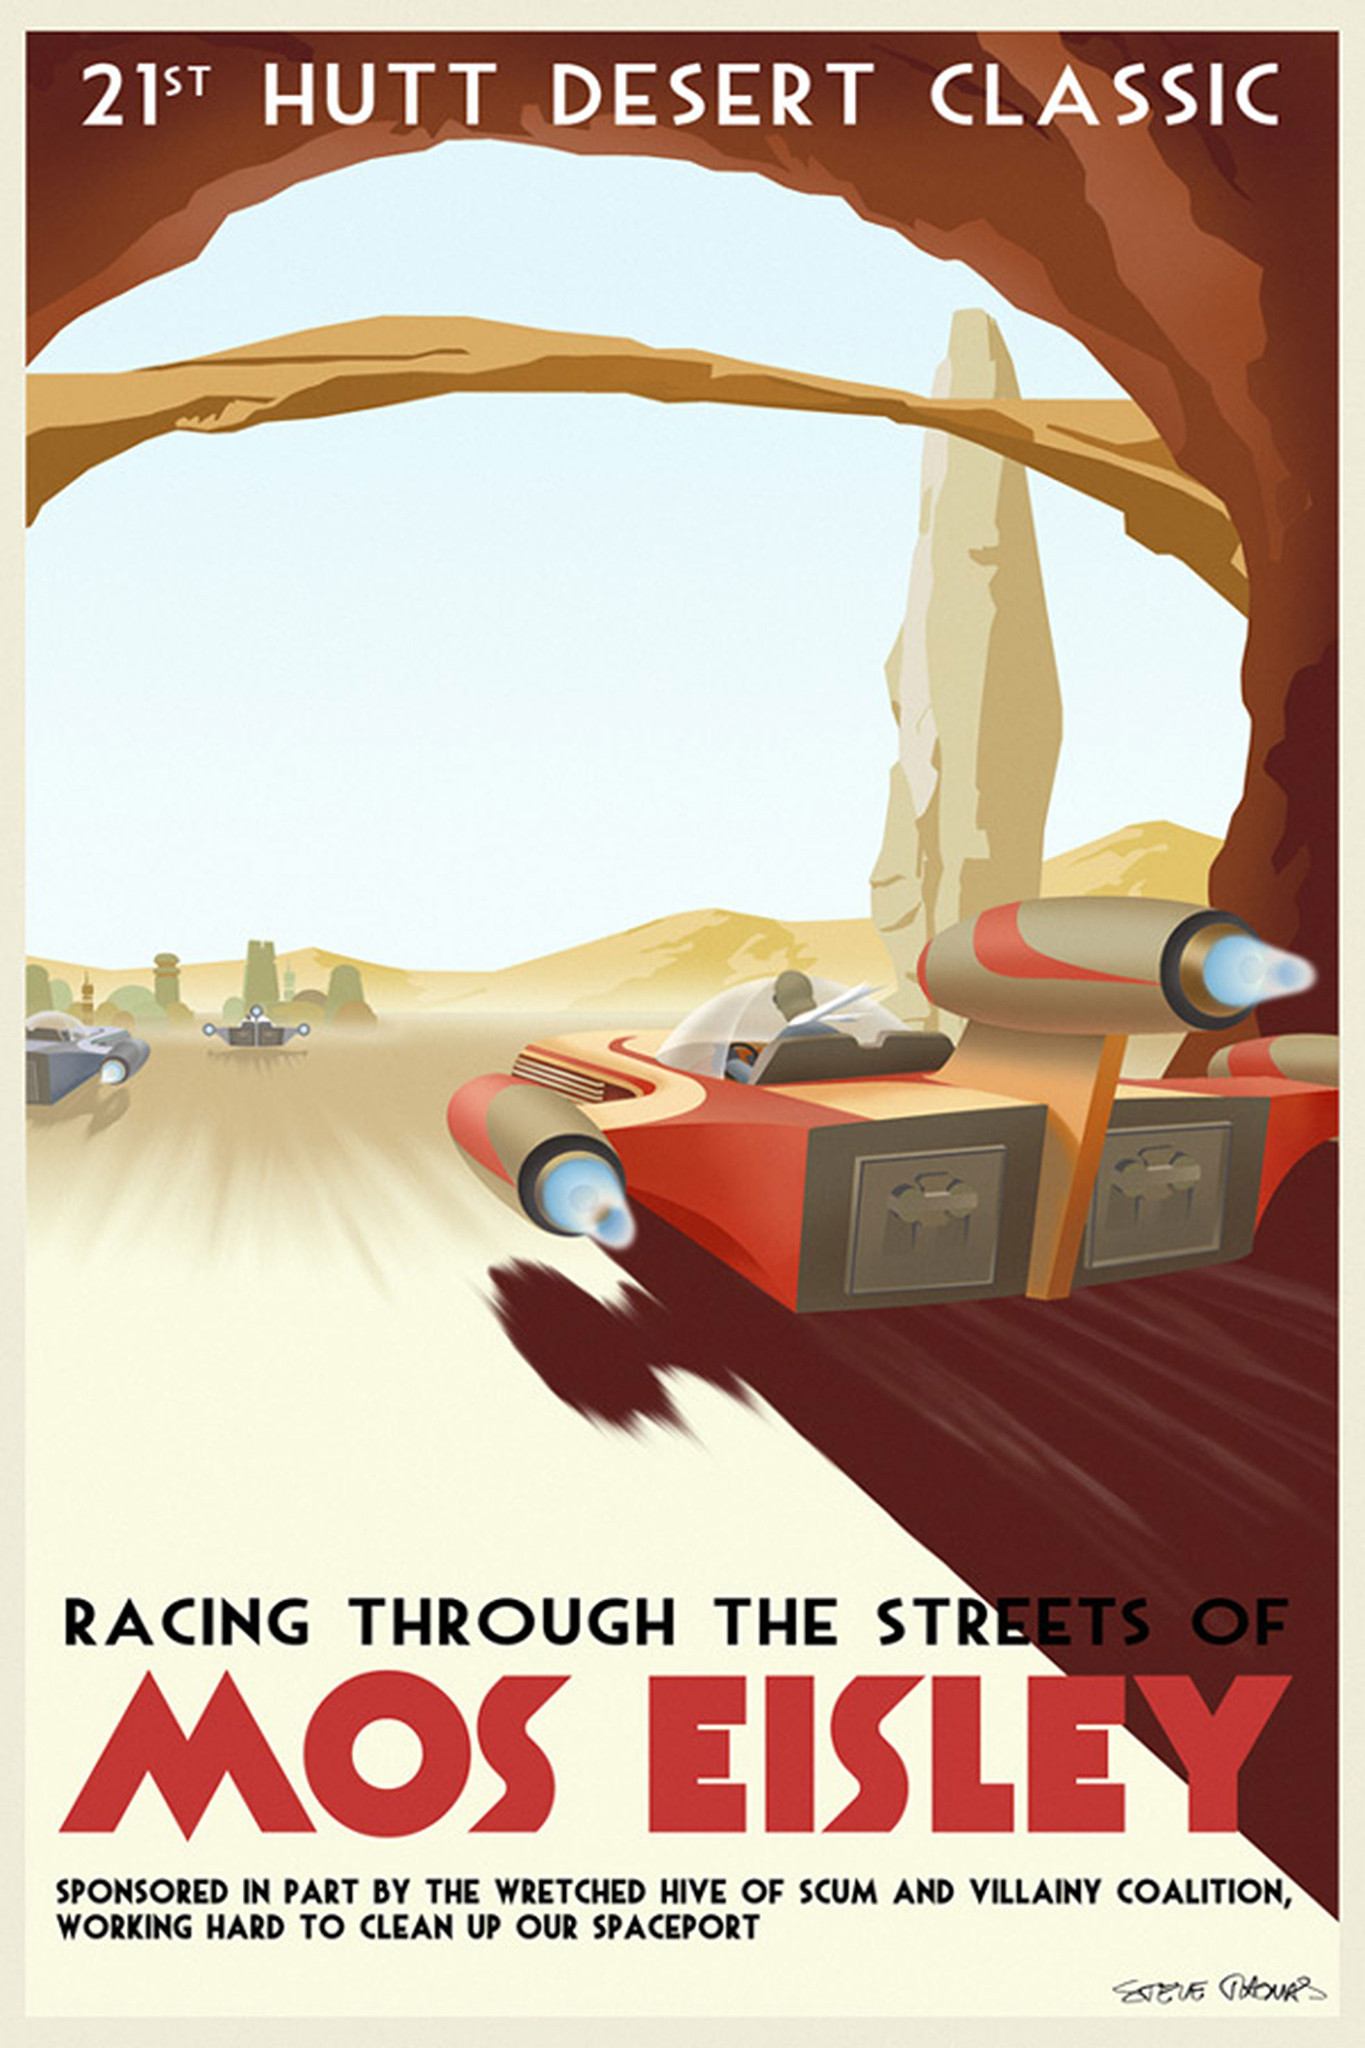 star-wars-travel-posters-steve-thomas-1